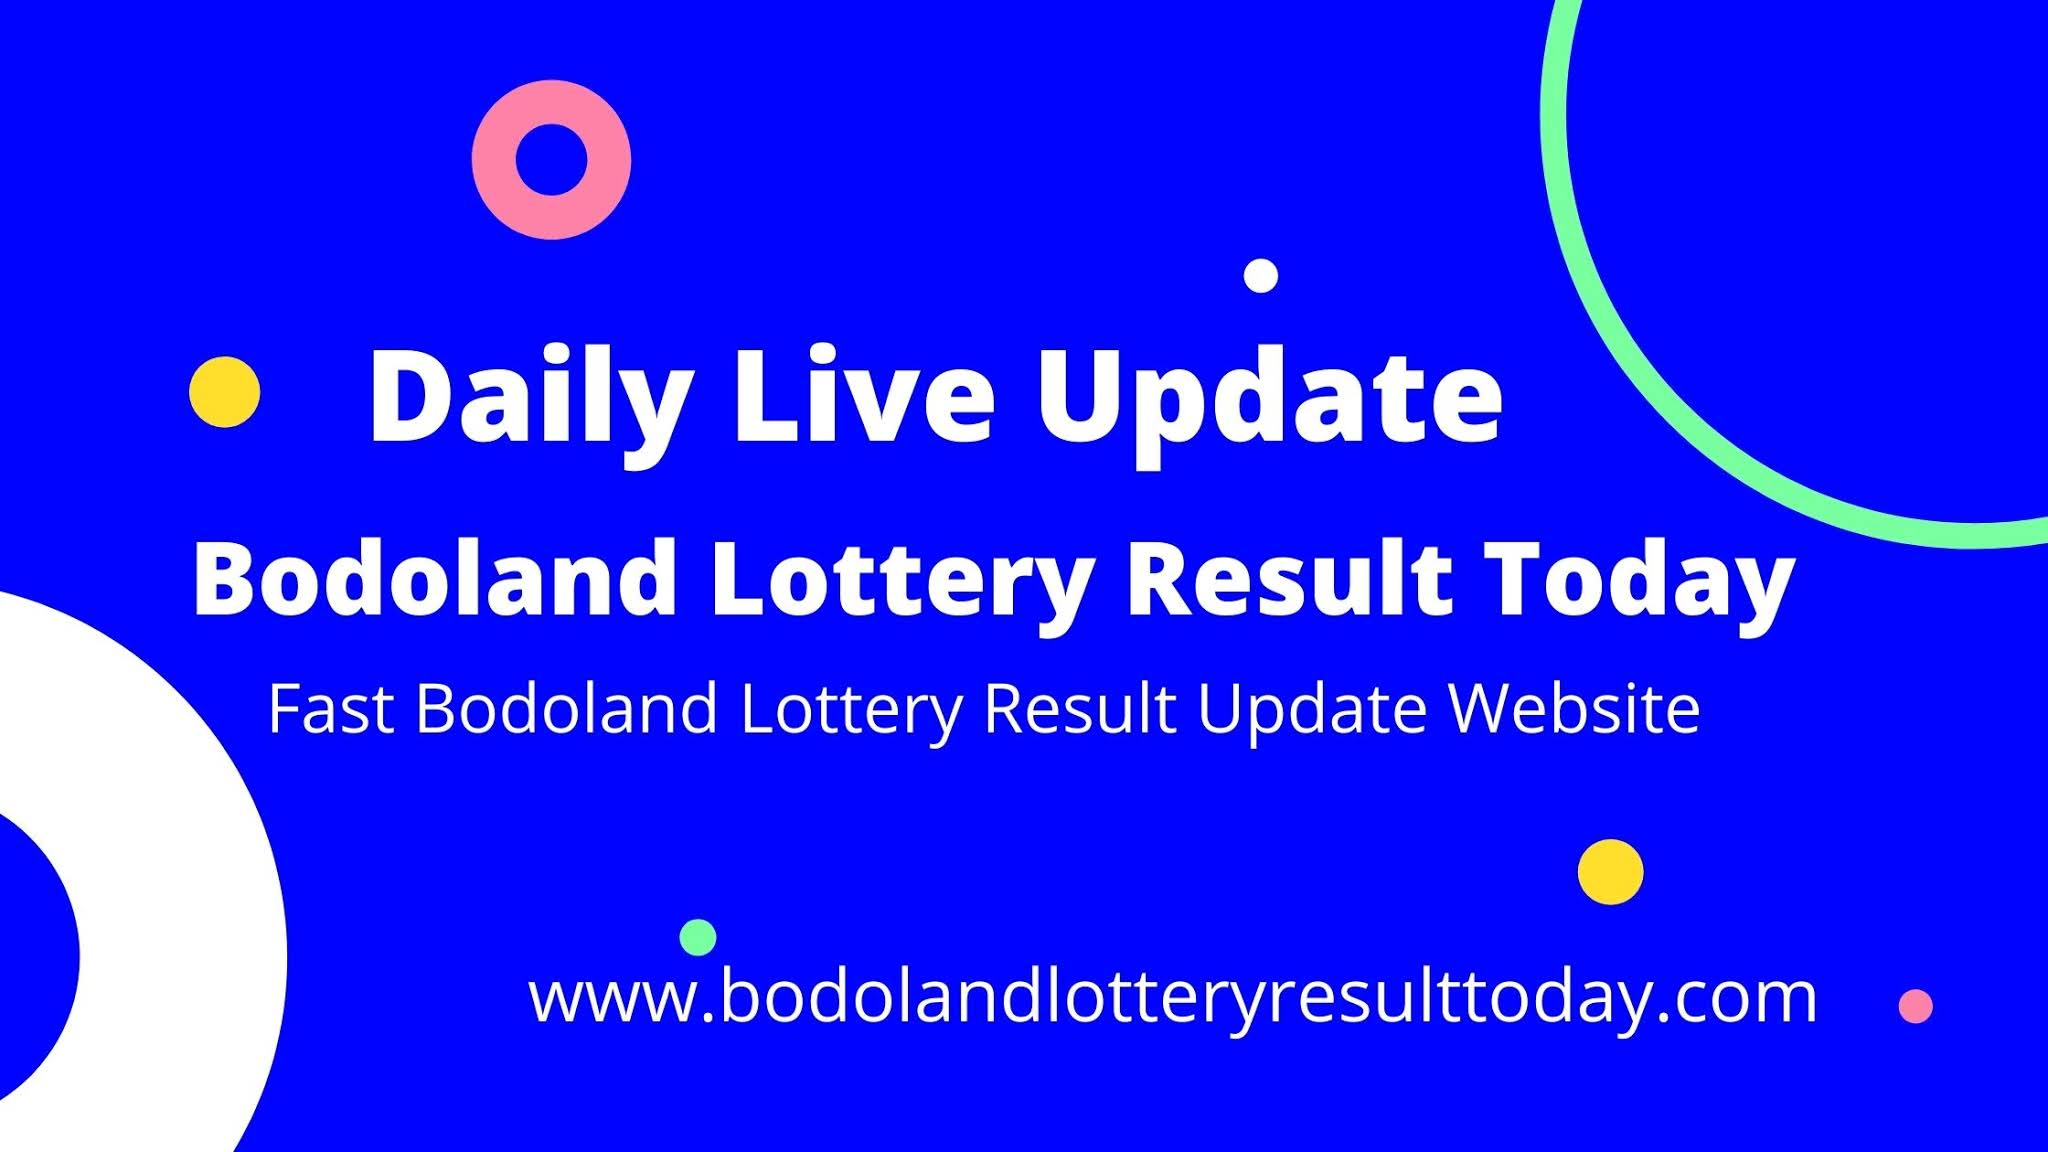 Bodoland Lottery Result